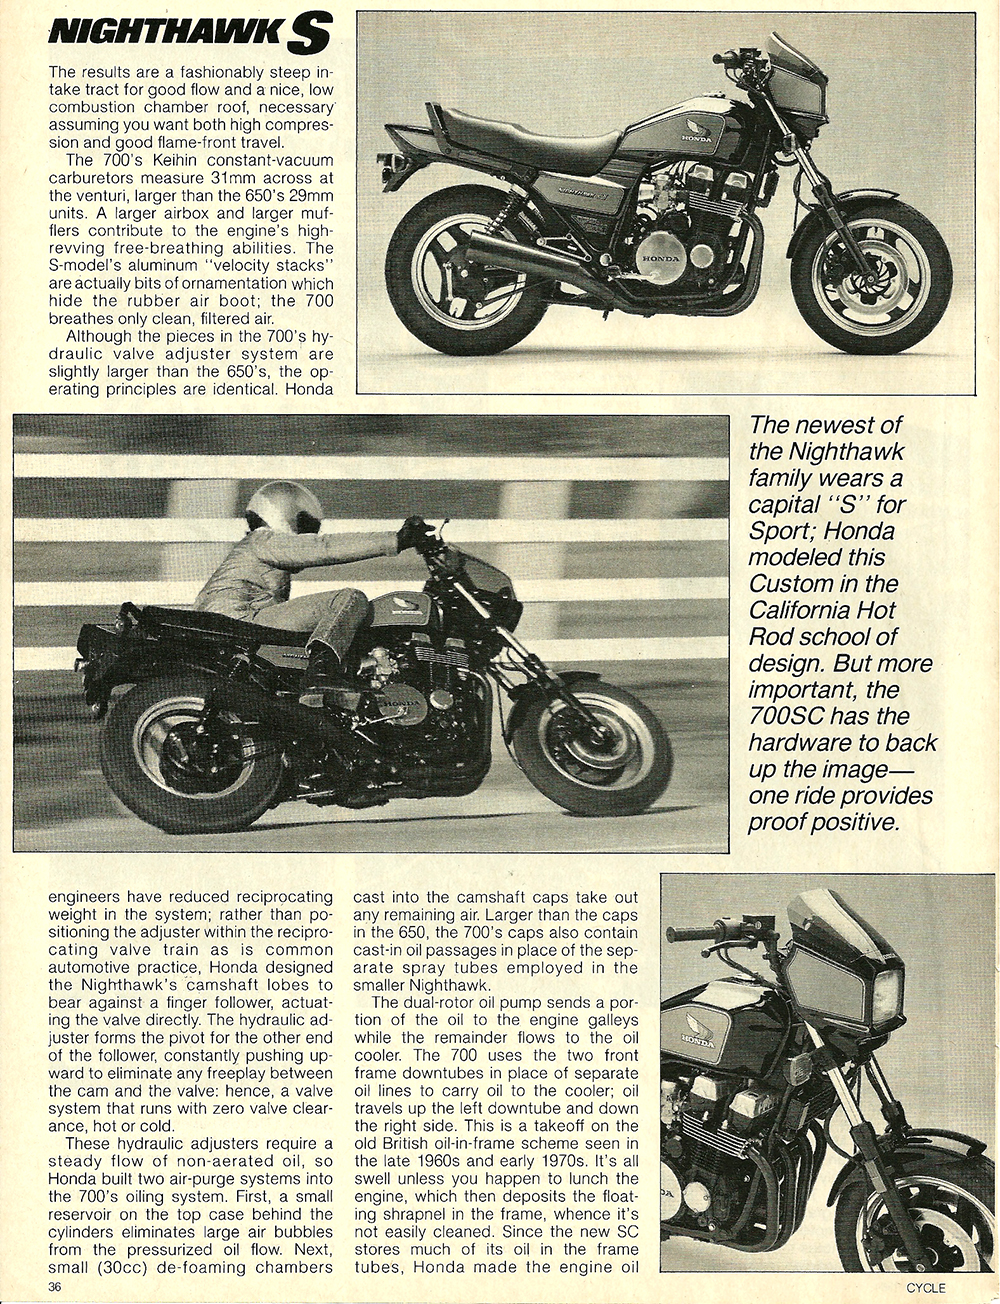 1984 Honda CB700SC Nighthawk S road test 5.jpg